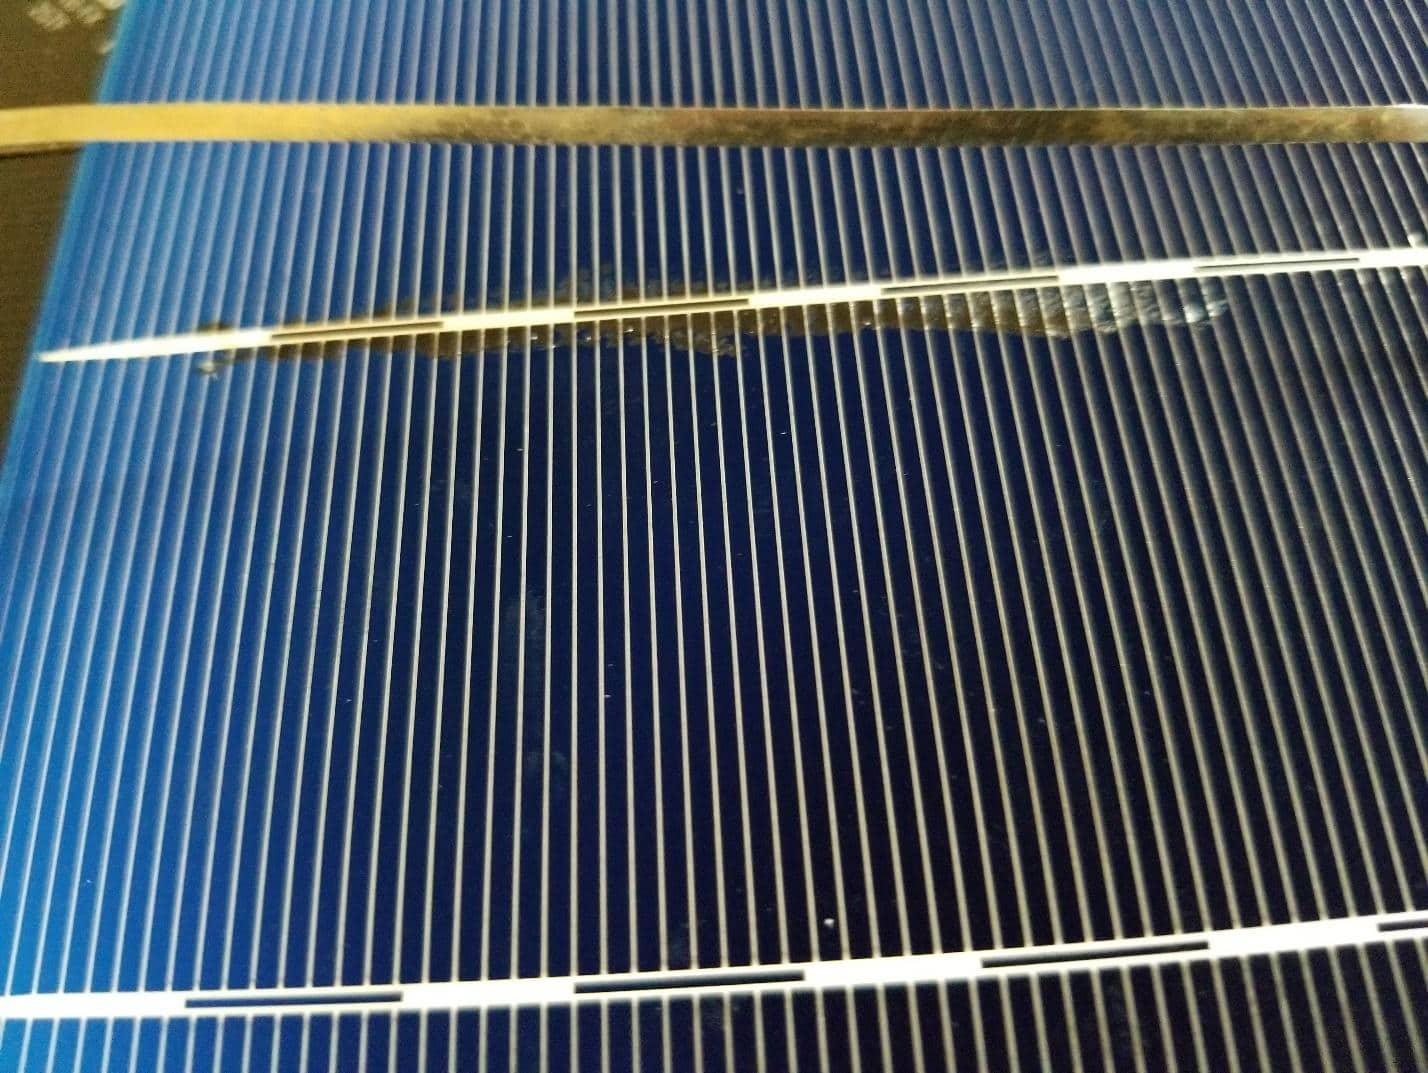 Solar_Panel_EP_MP_image2-min.jpg